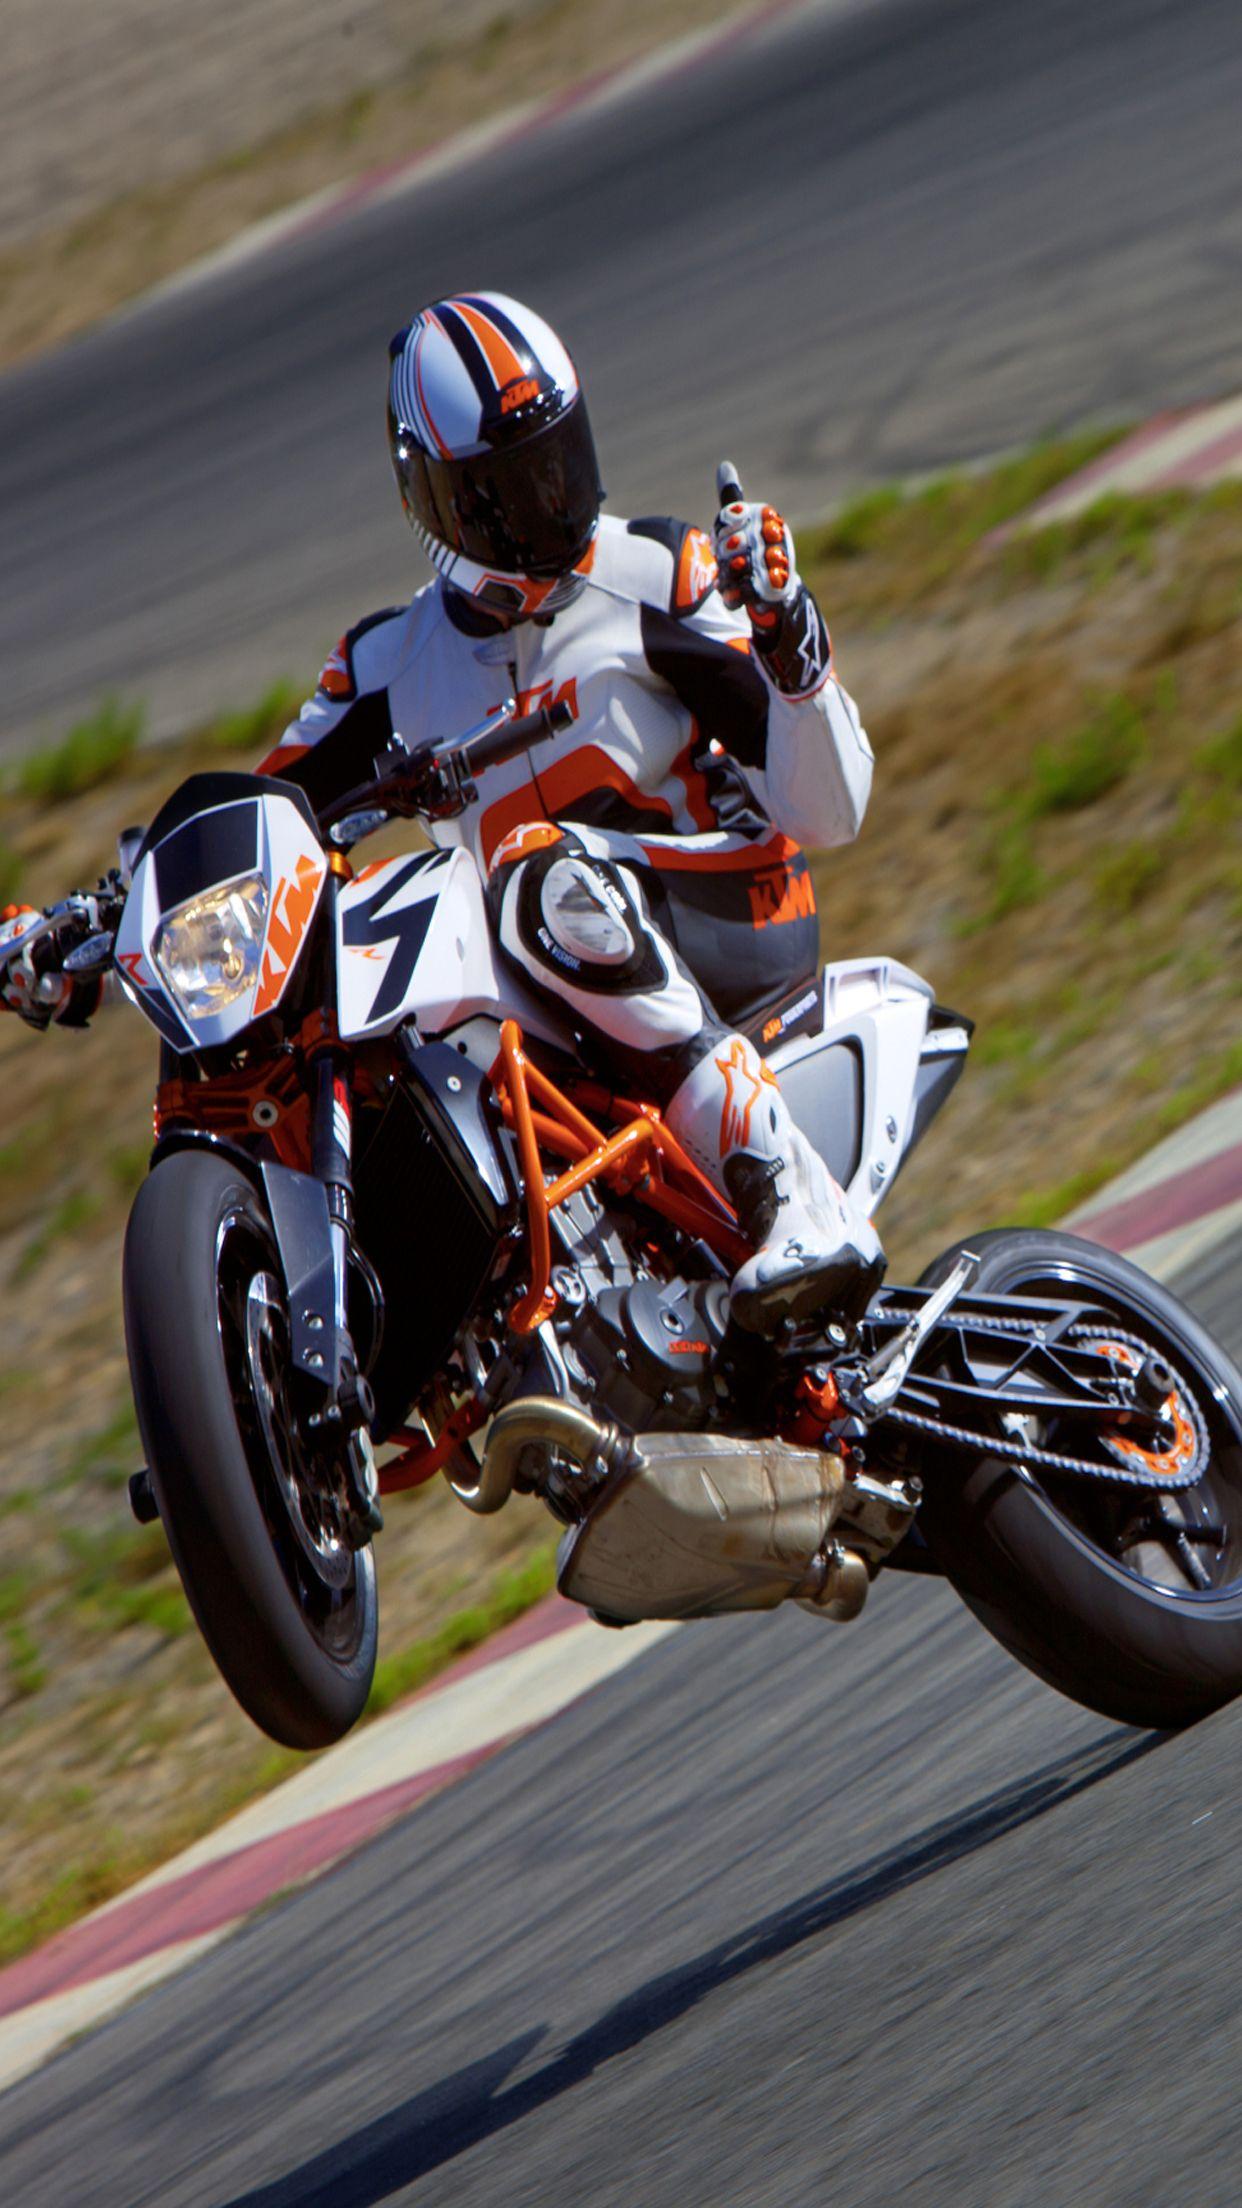 Ktm 690 Smc R 1 Ktm Moto Wallpapers Duke Motorcycle Ktm 690 enduro r eicma wallpaper